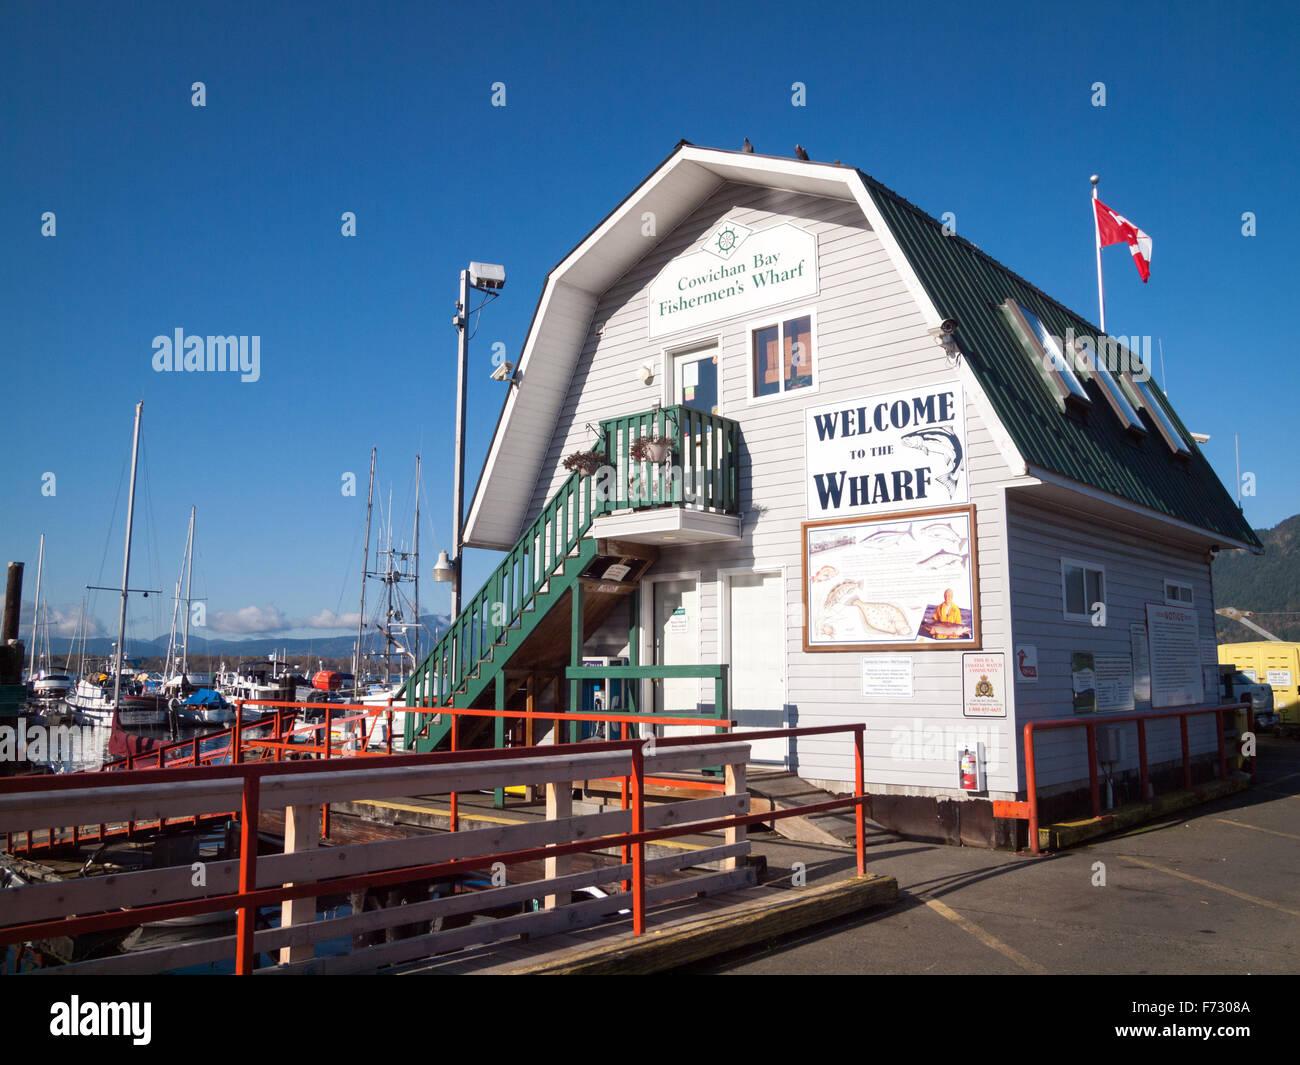 Fishermen's Wharf in Cowichan Bay, Vancouver Island, British Columbia, Canada. - Stock Image